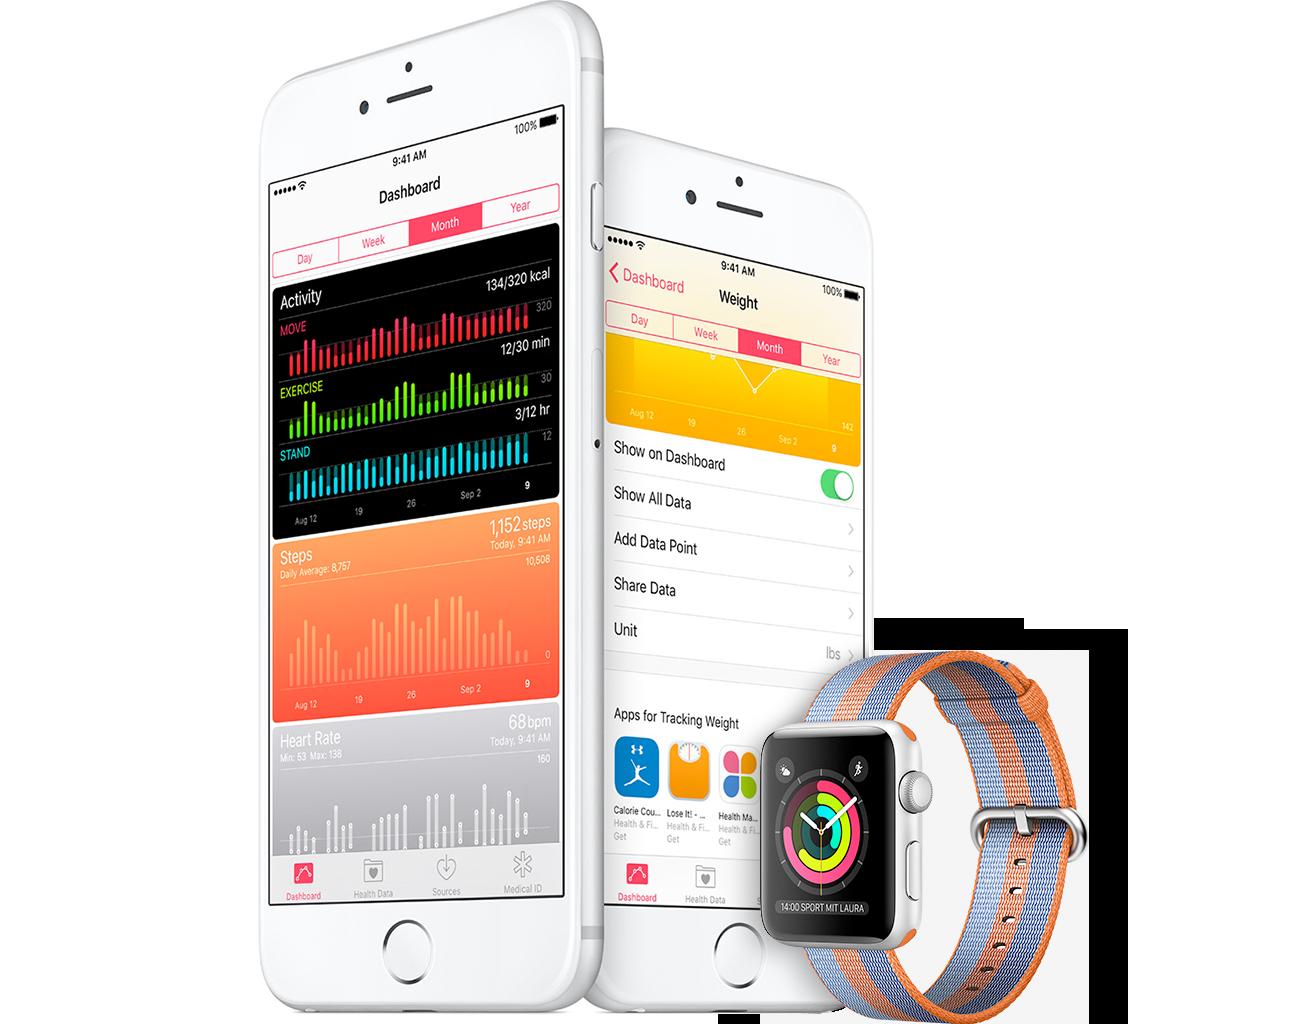 Mobile Health mit iPhone und Wearables